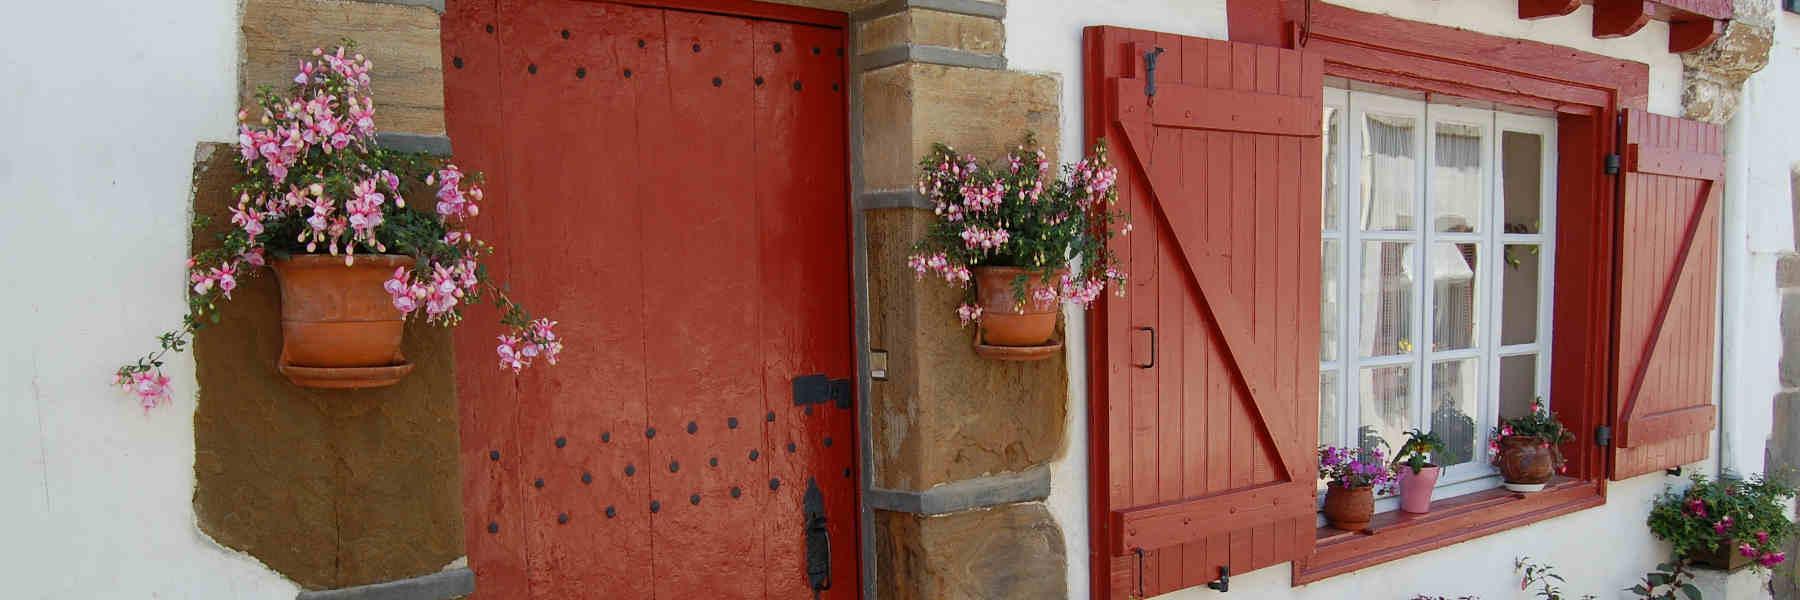 Visite du village de Labastide-Clairence